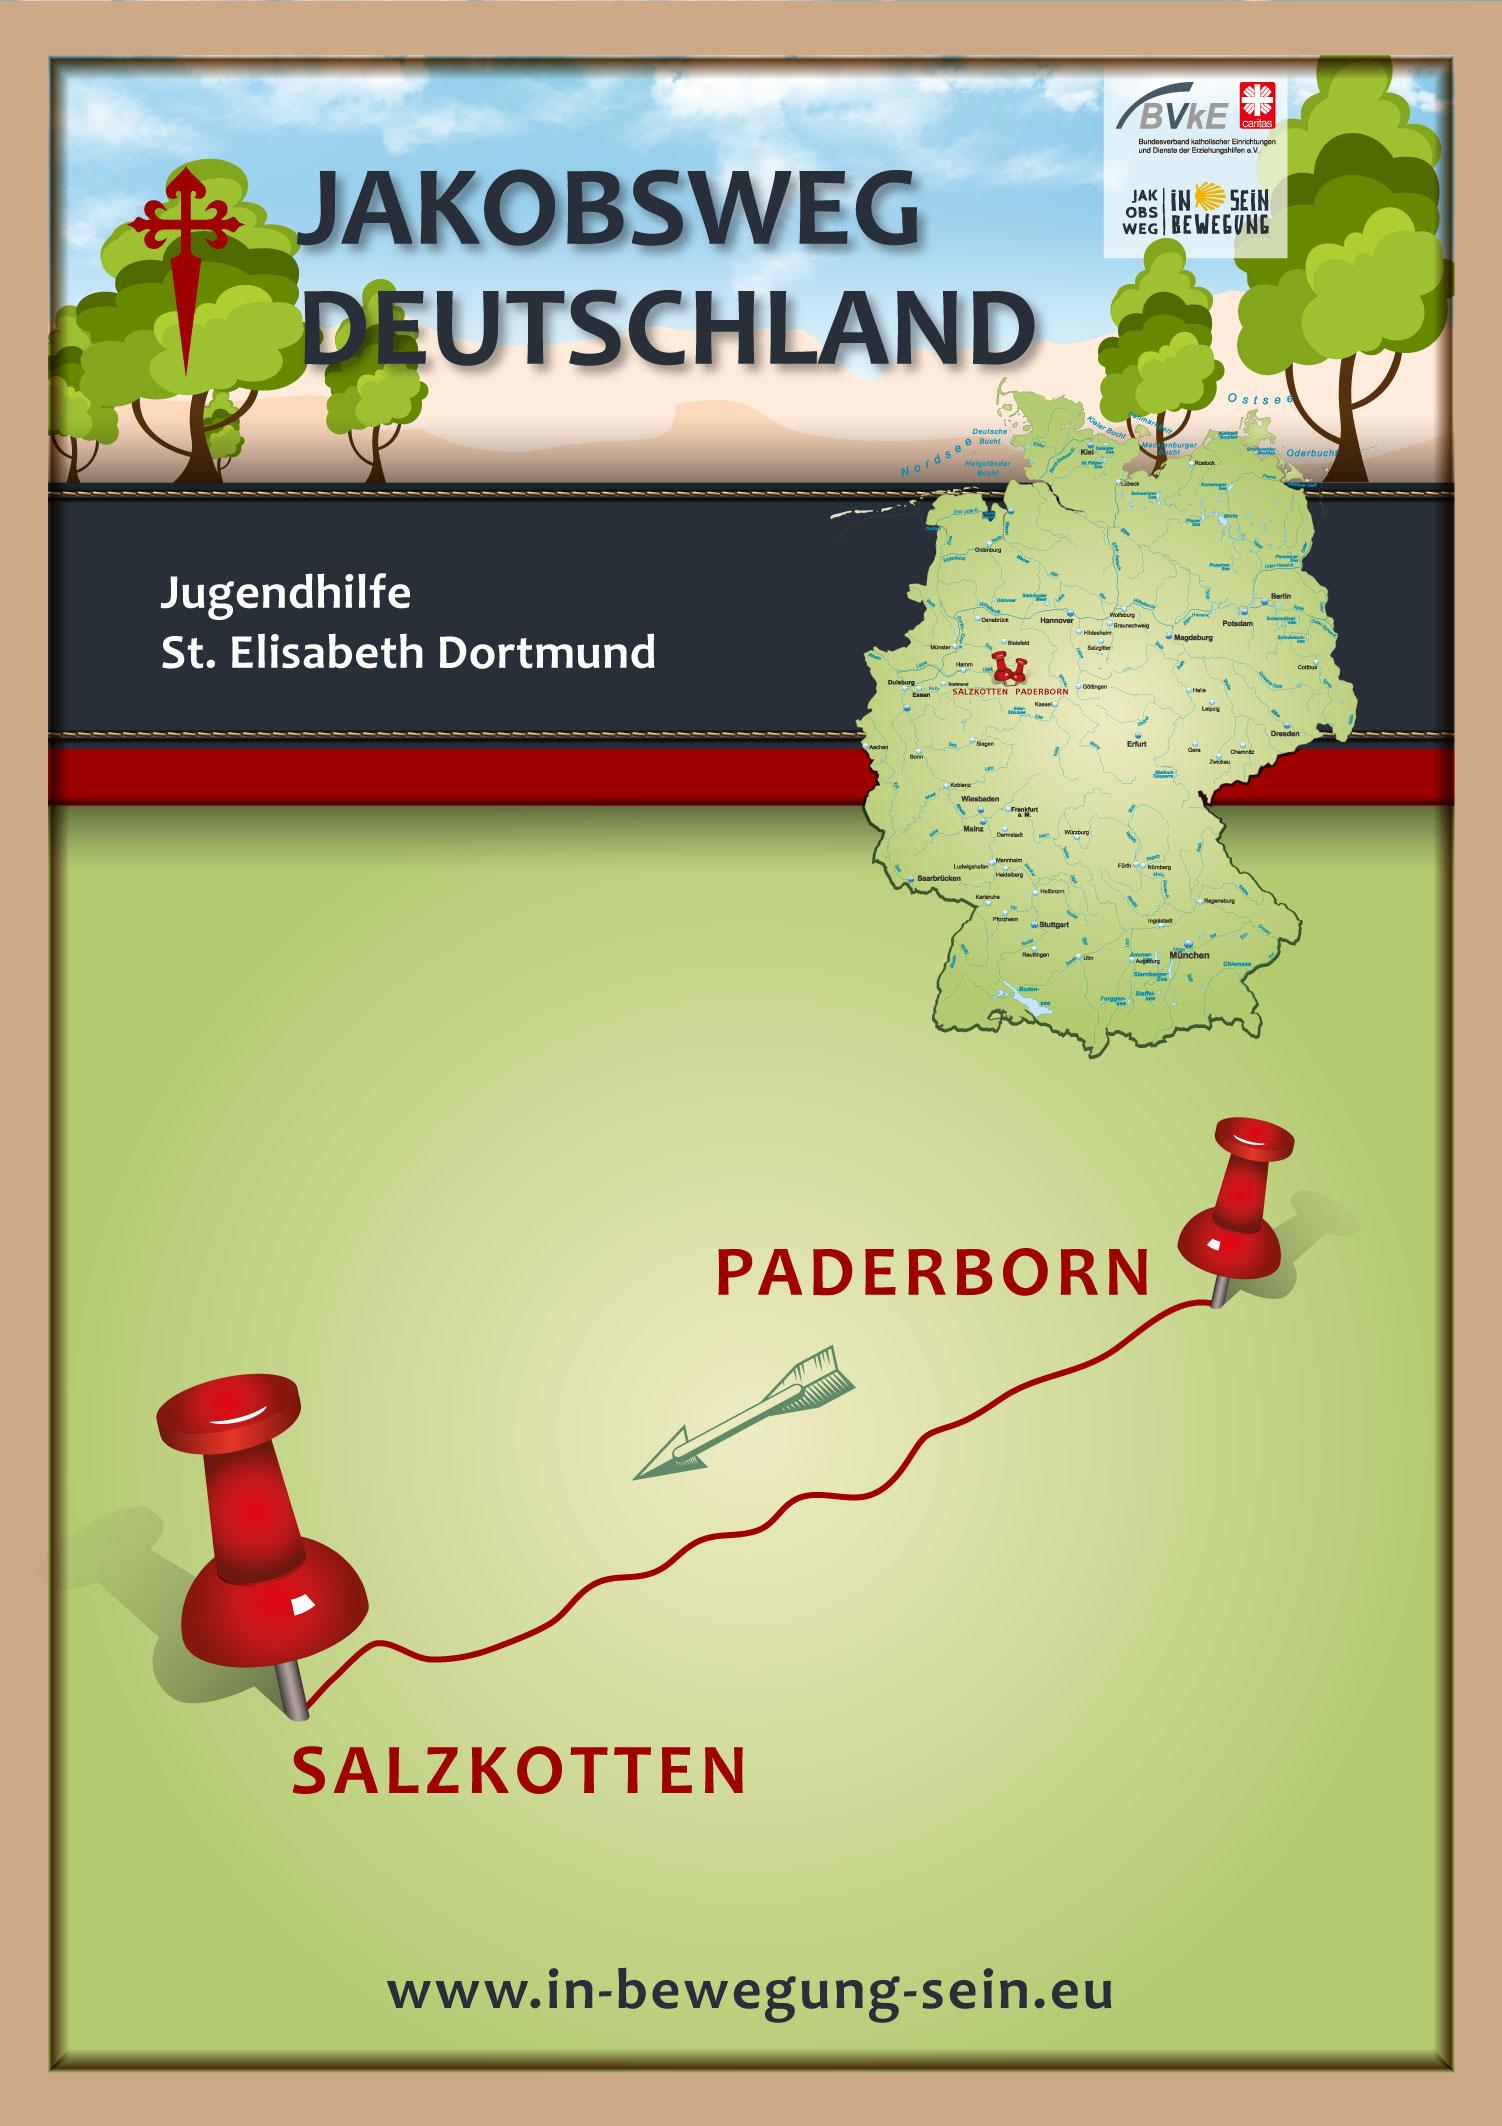 Posterkarte-Josefshaus-Jugendhilfe-St-Elisabeth-Dortmund-Plakat